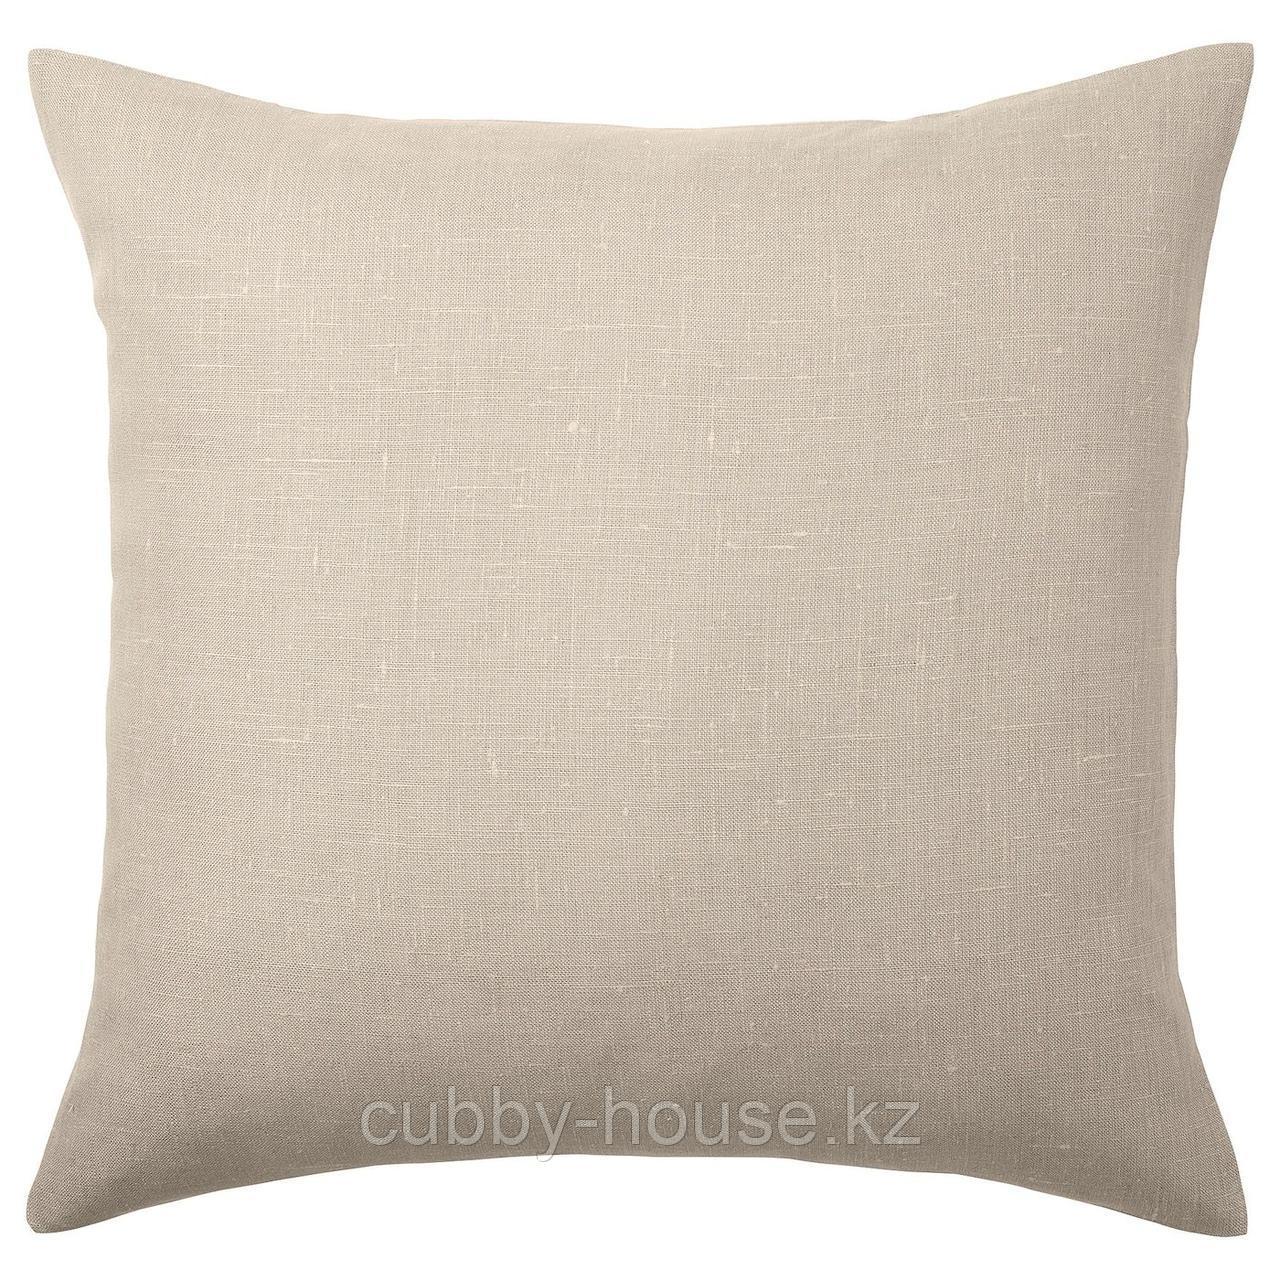 АЙНА Чехол на подушку, бежевый, 50x50 см